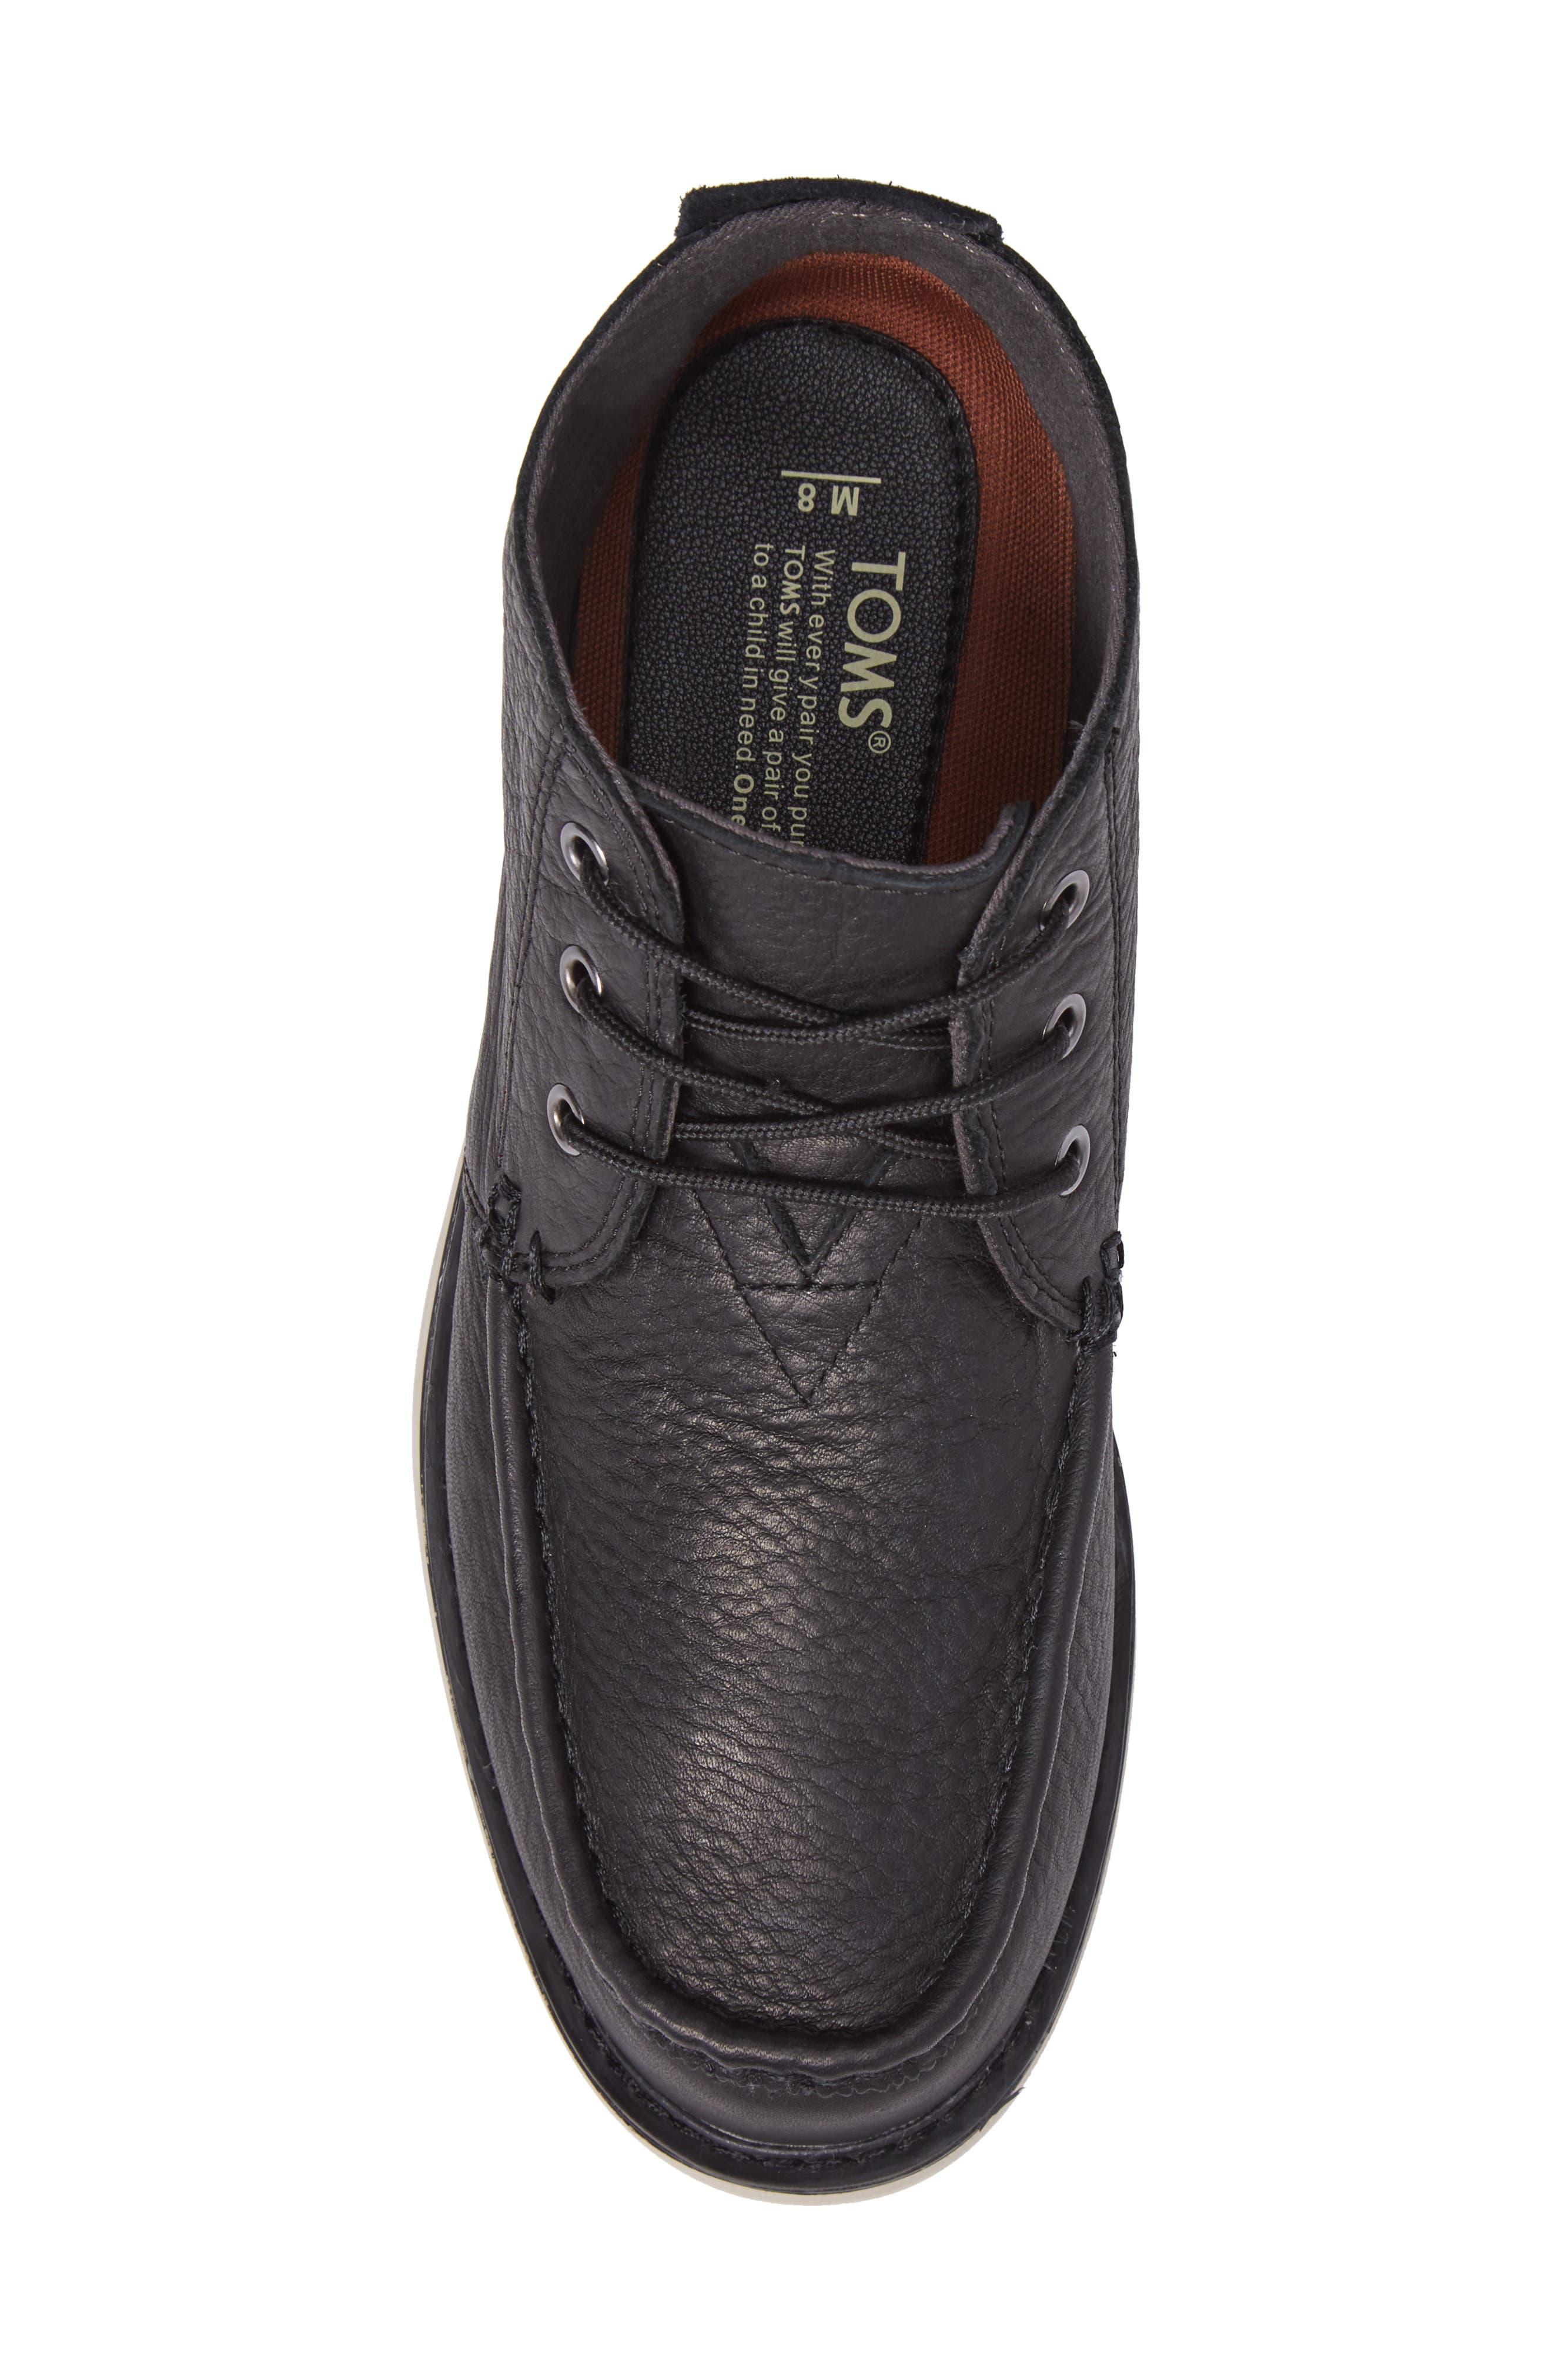 Chukka Boot,                             Alternate thumbnail 5, color,                             Black/Black Leather